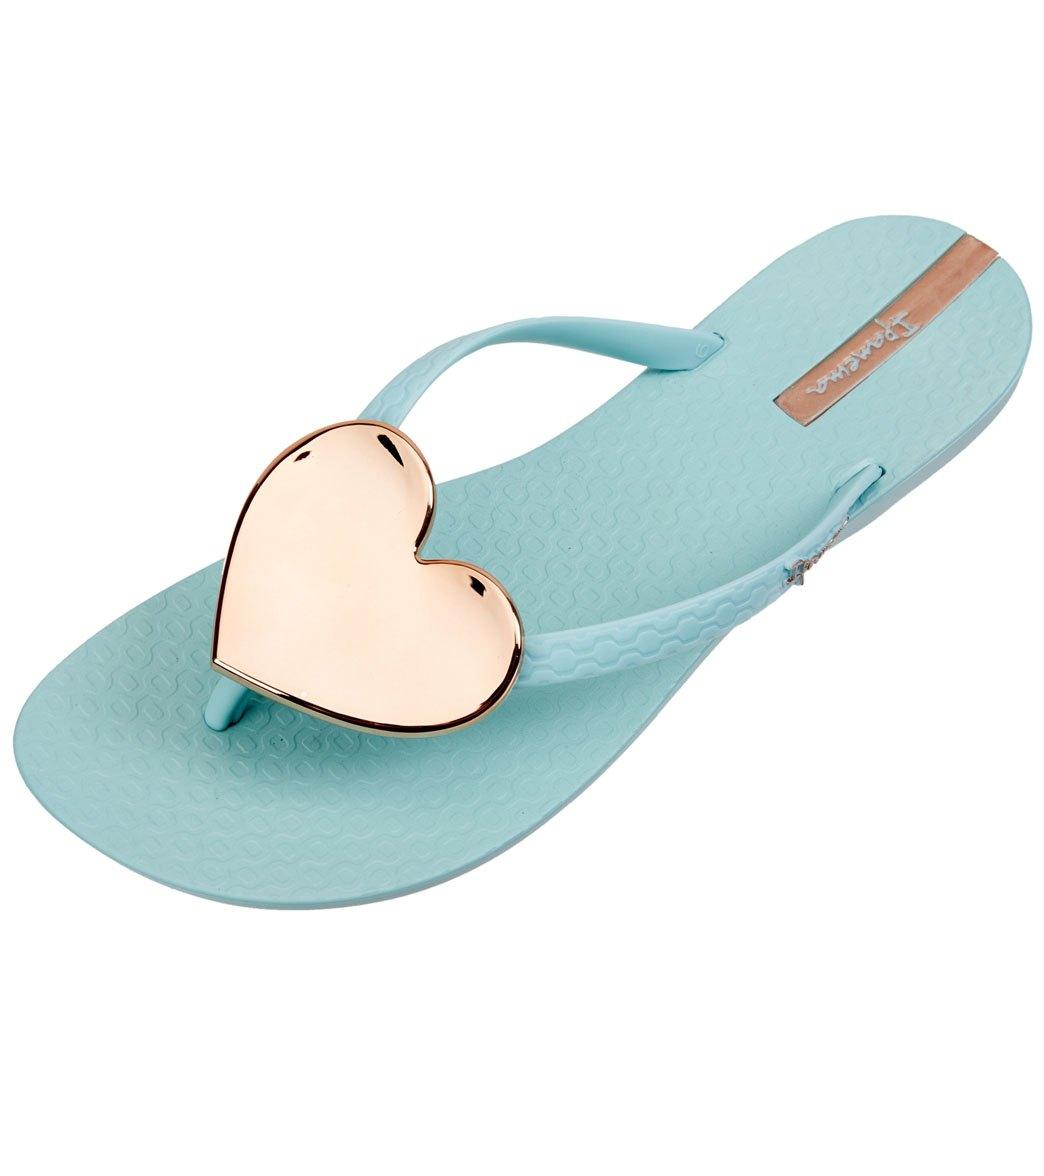 893b92c8f512 Ipanema Women s Wave Heart Flip Flop at SwimOutlet.com